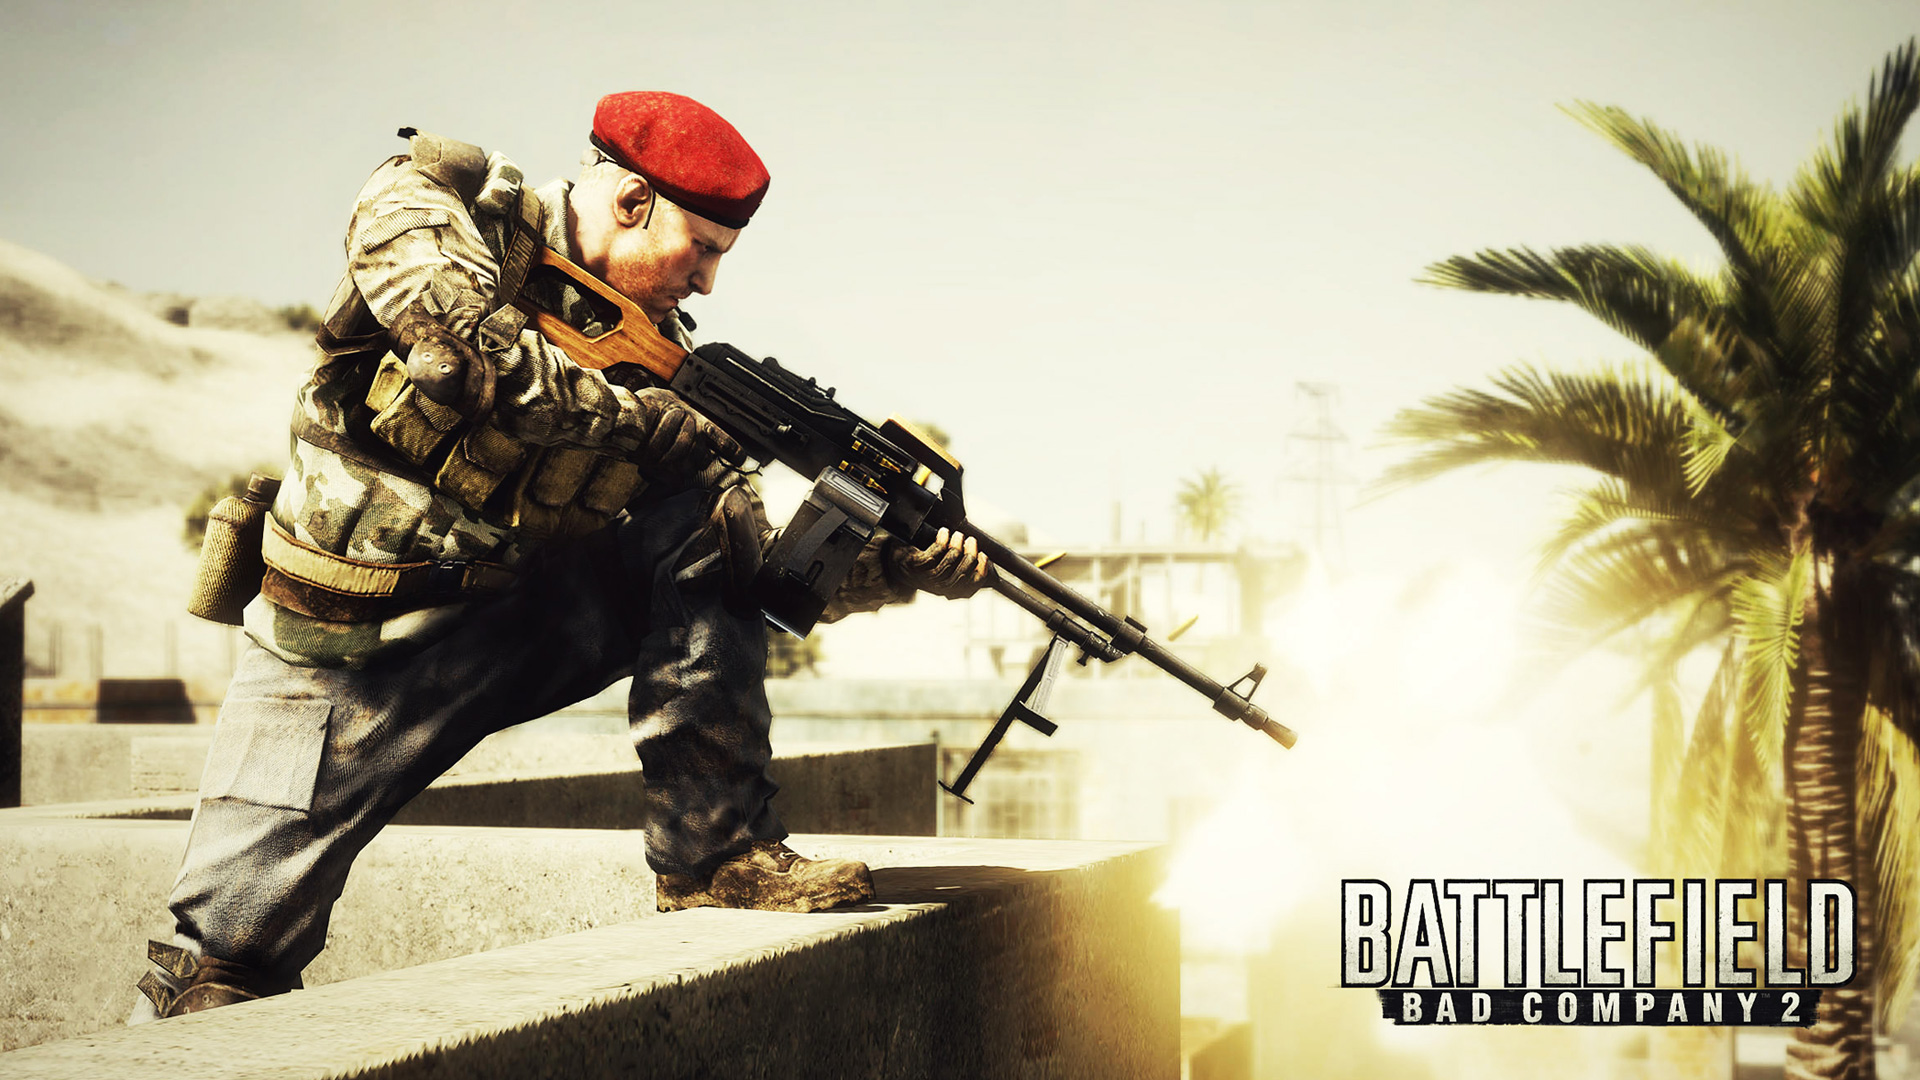 Battlefield Bad Company 2 Wallpaper 7 Wallpapersbq